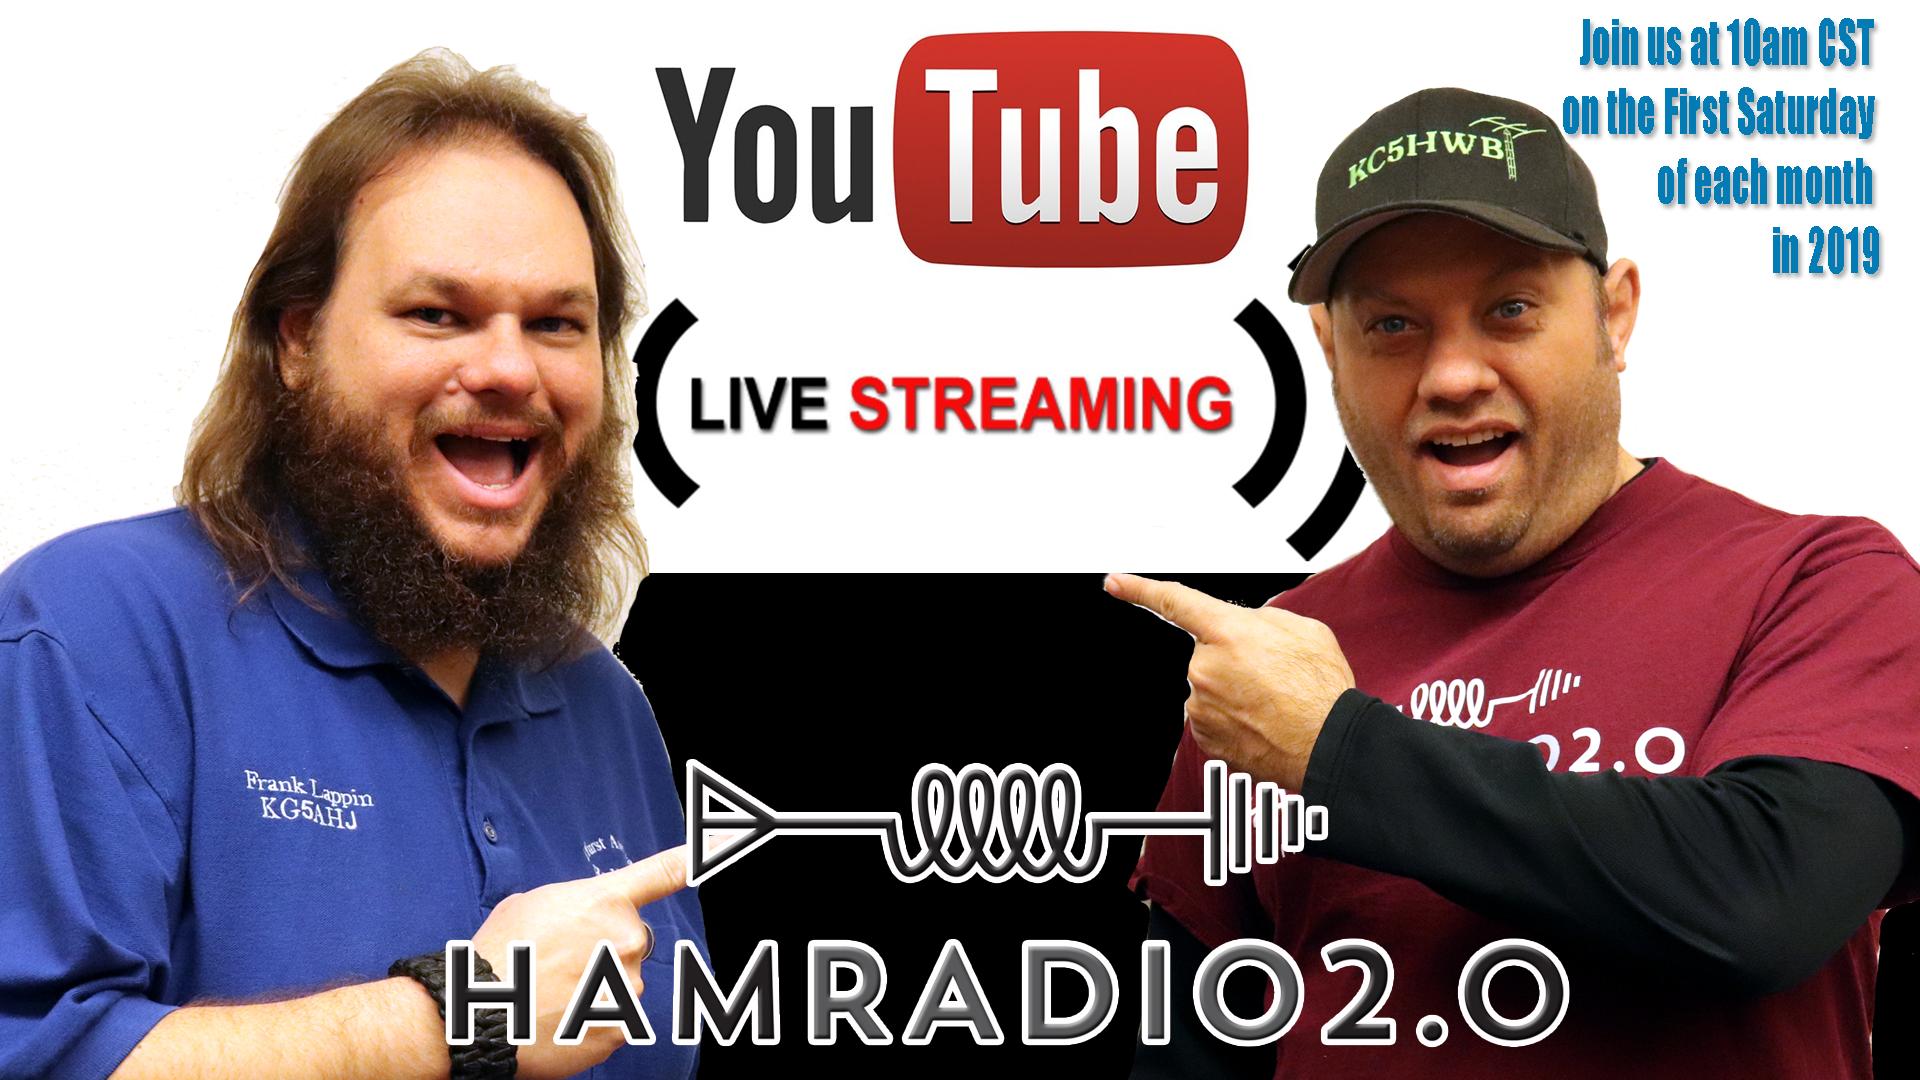 Episode 234: Ham Radio 2.0 Live Stream: Allstar